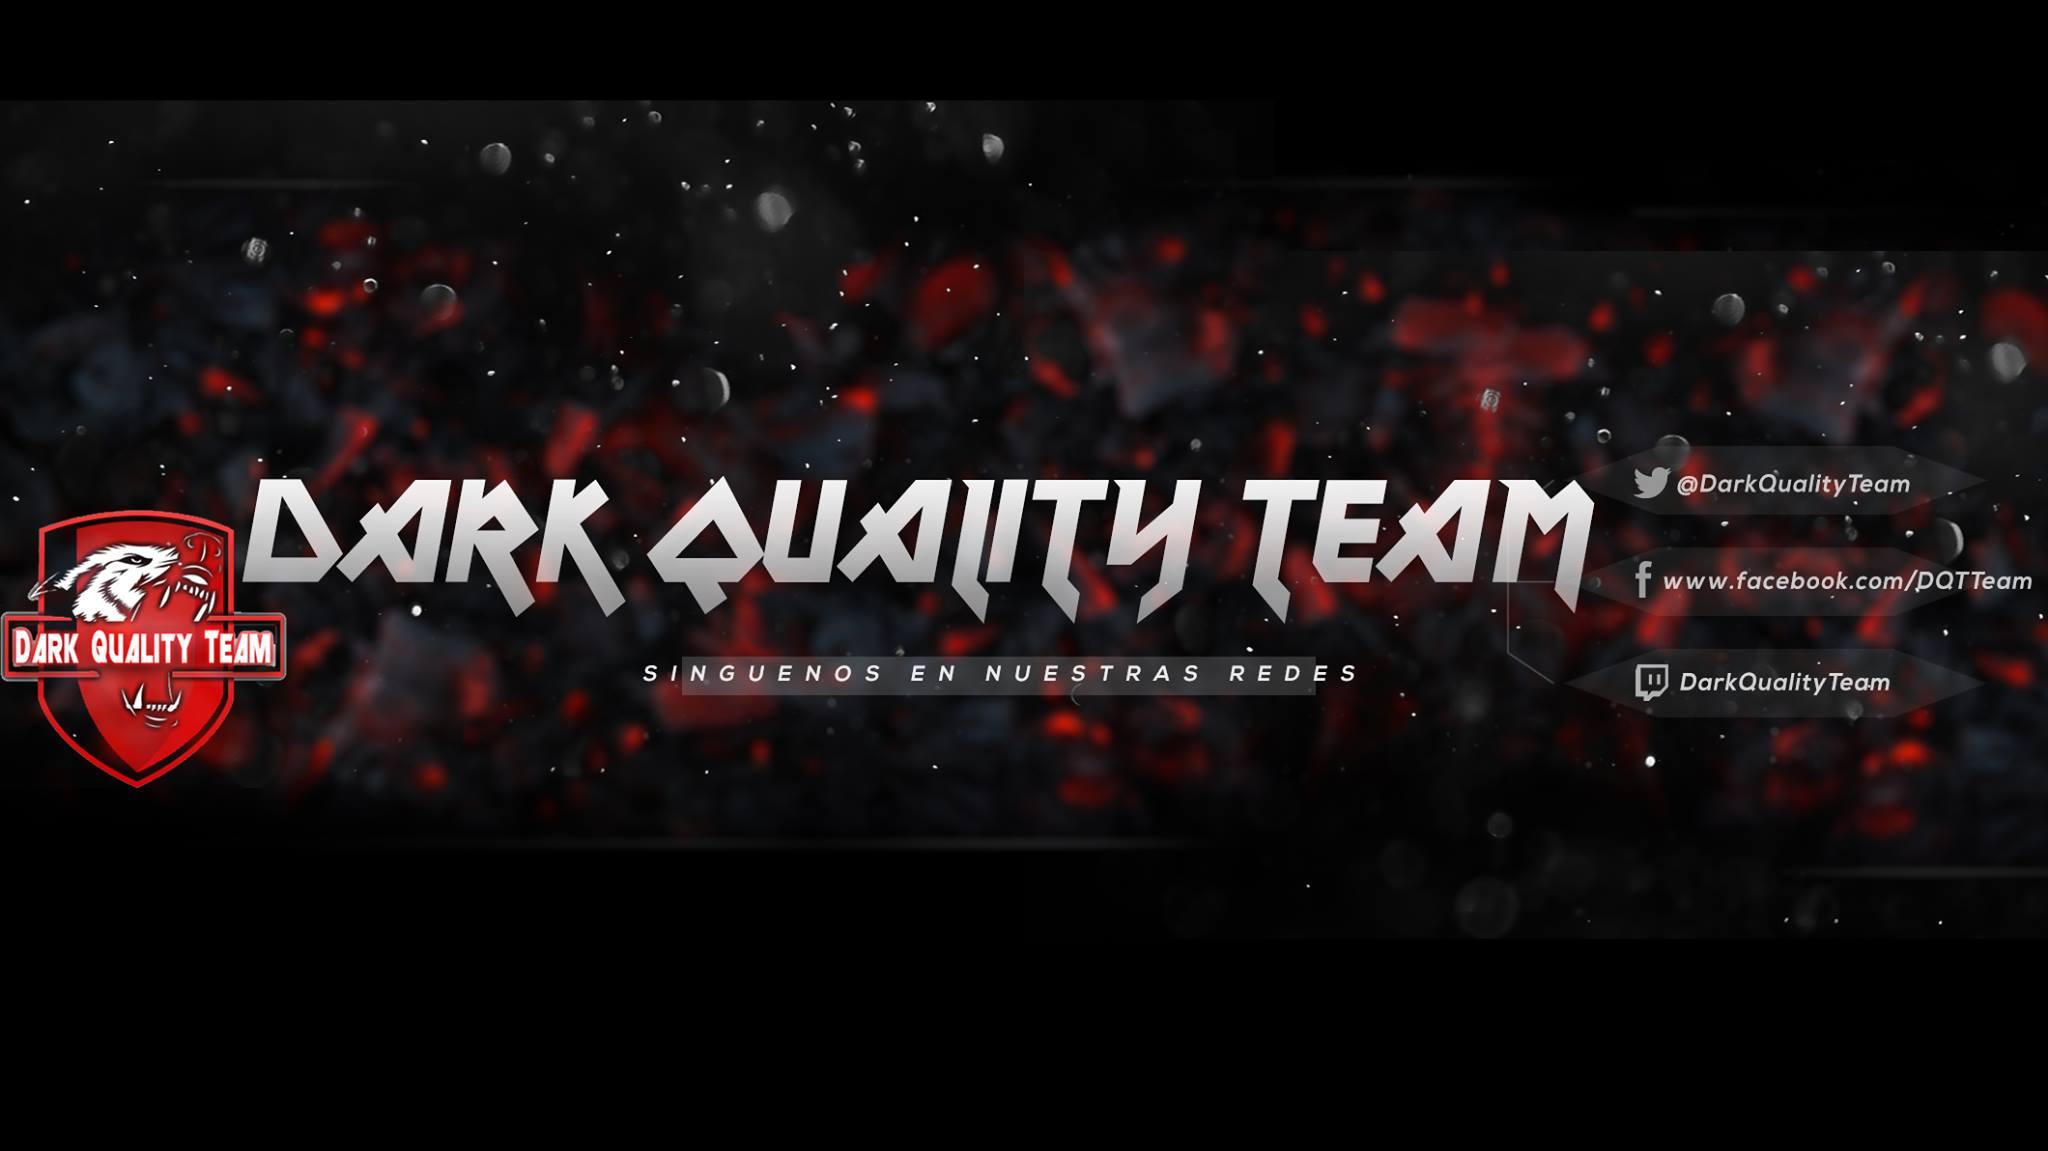 Dark Quality